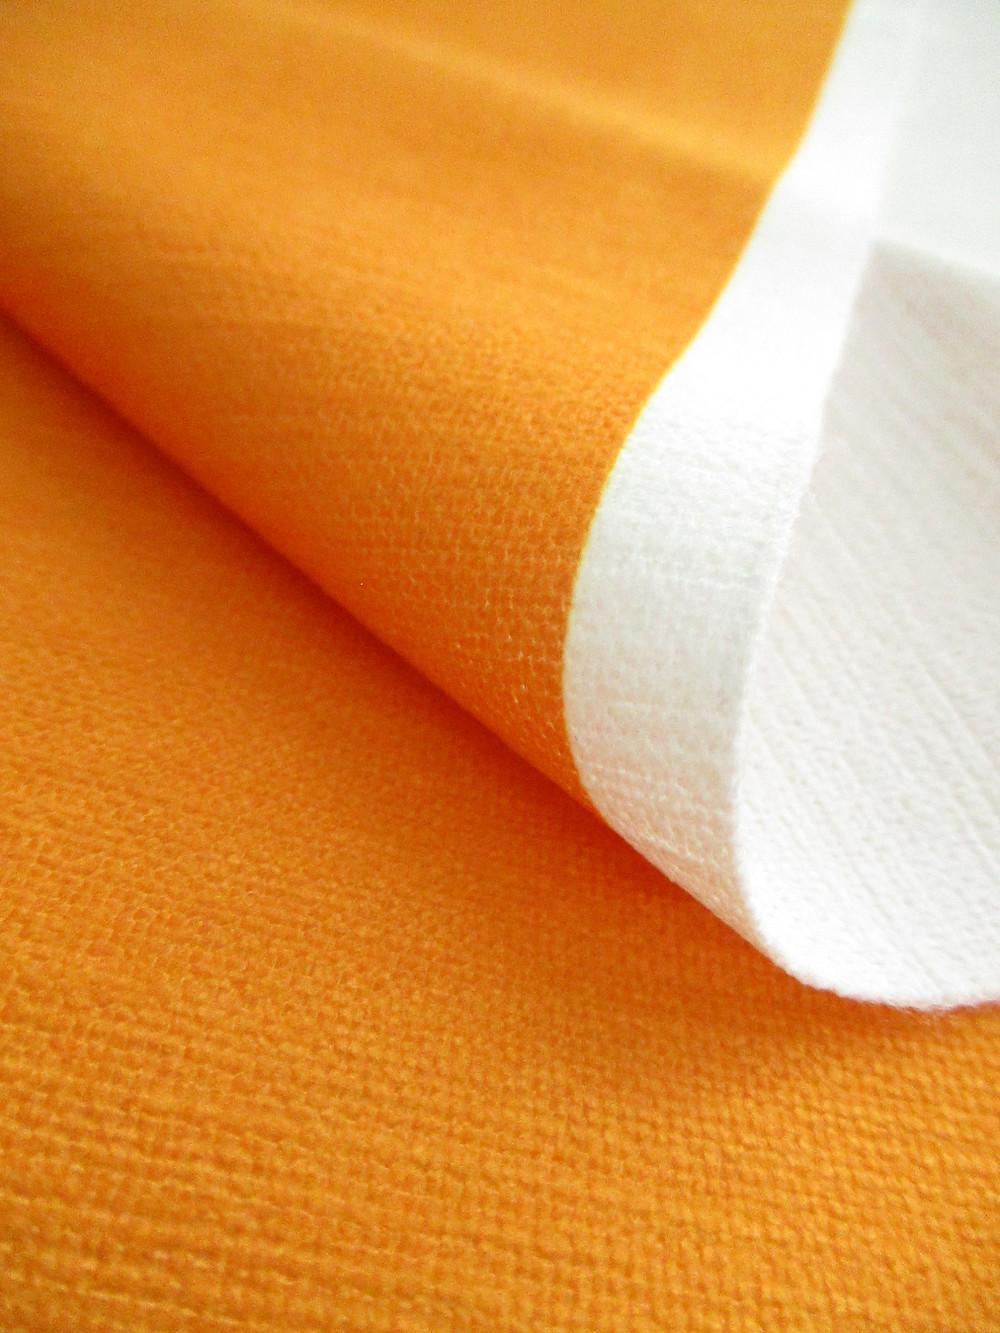 Frantasia Haze Fabric, Colourful Fabric, Interior Fabric, Beautiful Fabric, Luxury Fabric, Harrogate Interiors